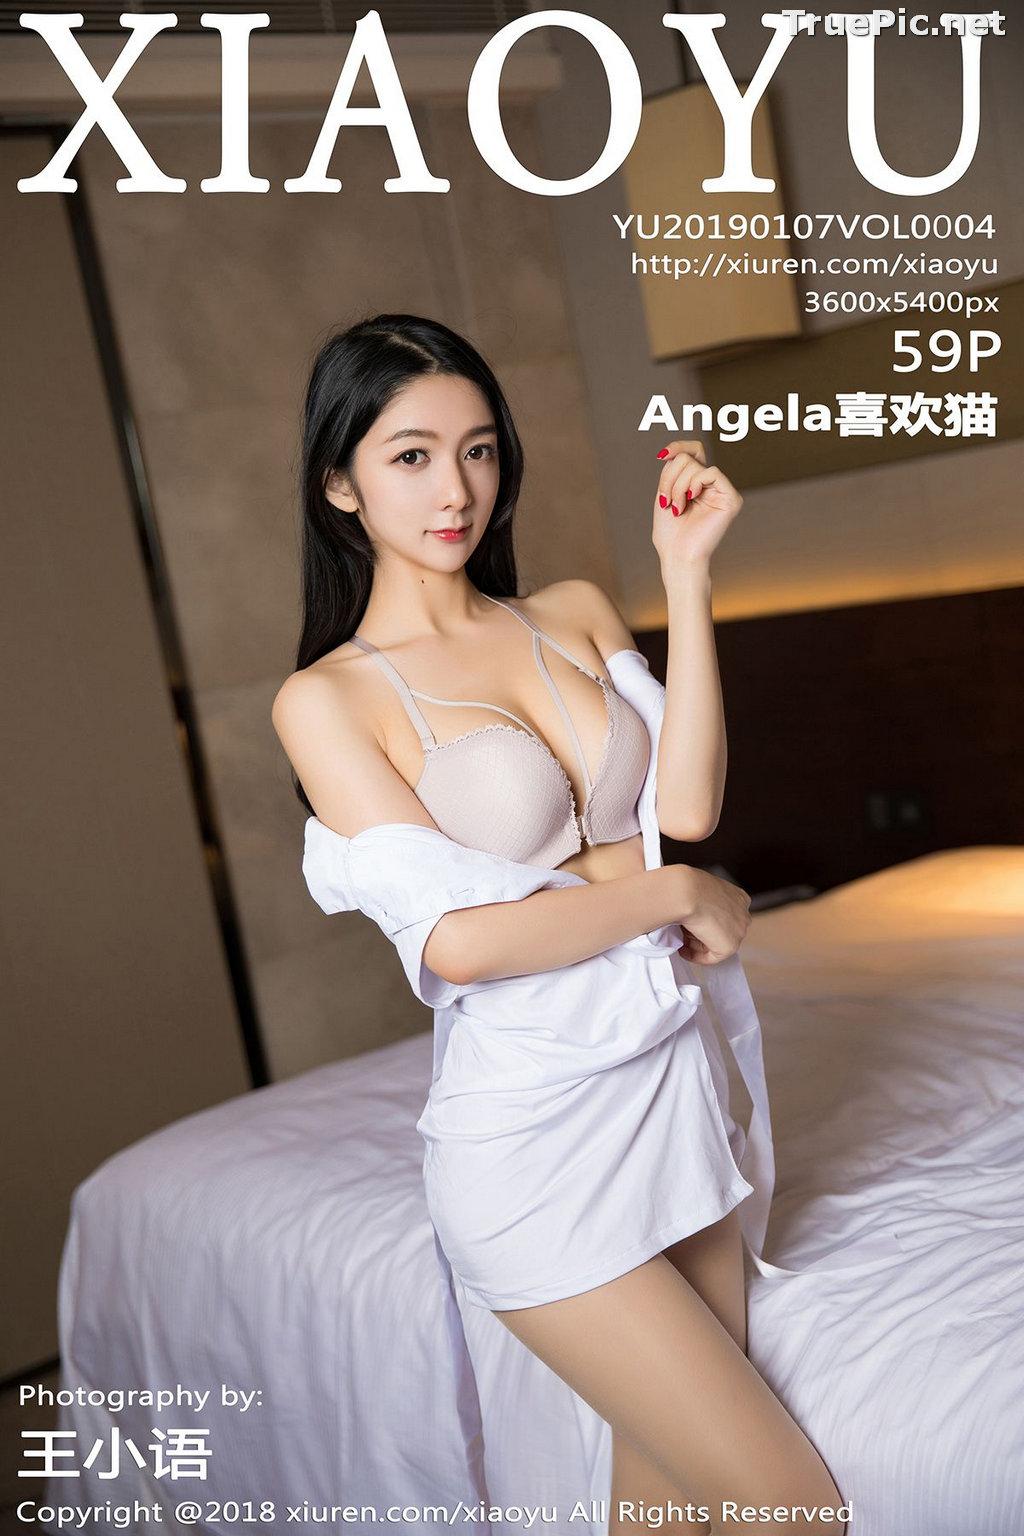 Image XiaoYu No.004 - Chinese Model - Xiao Reba (Angela喜欢猫) - White Sexy Nurse - TruePic.net - Picture-60